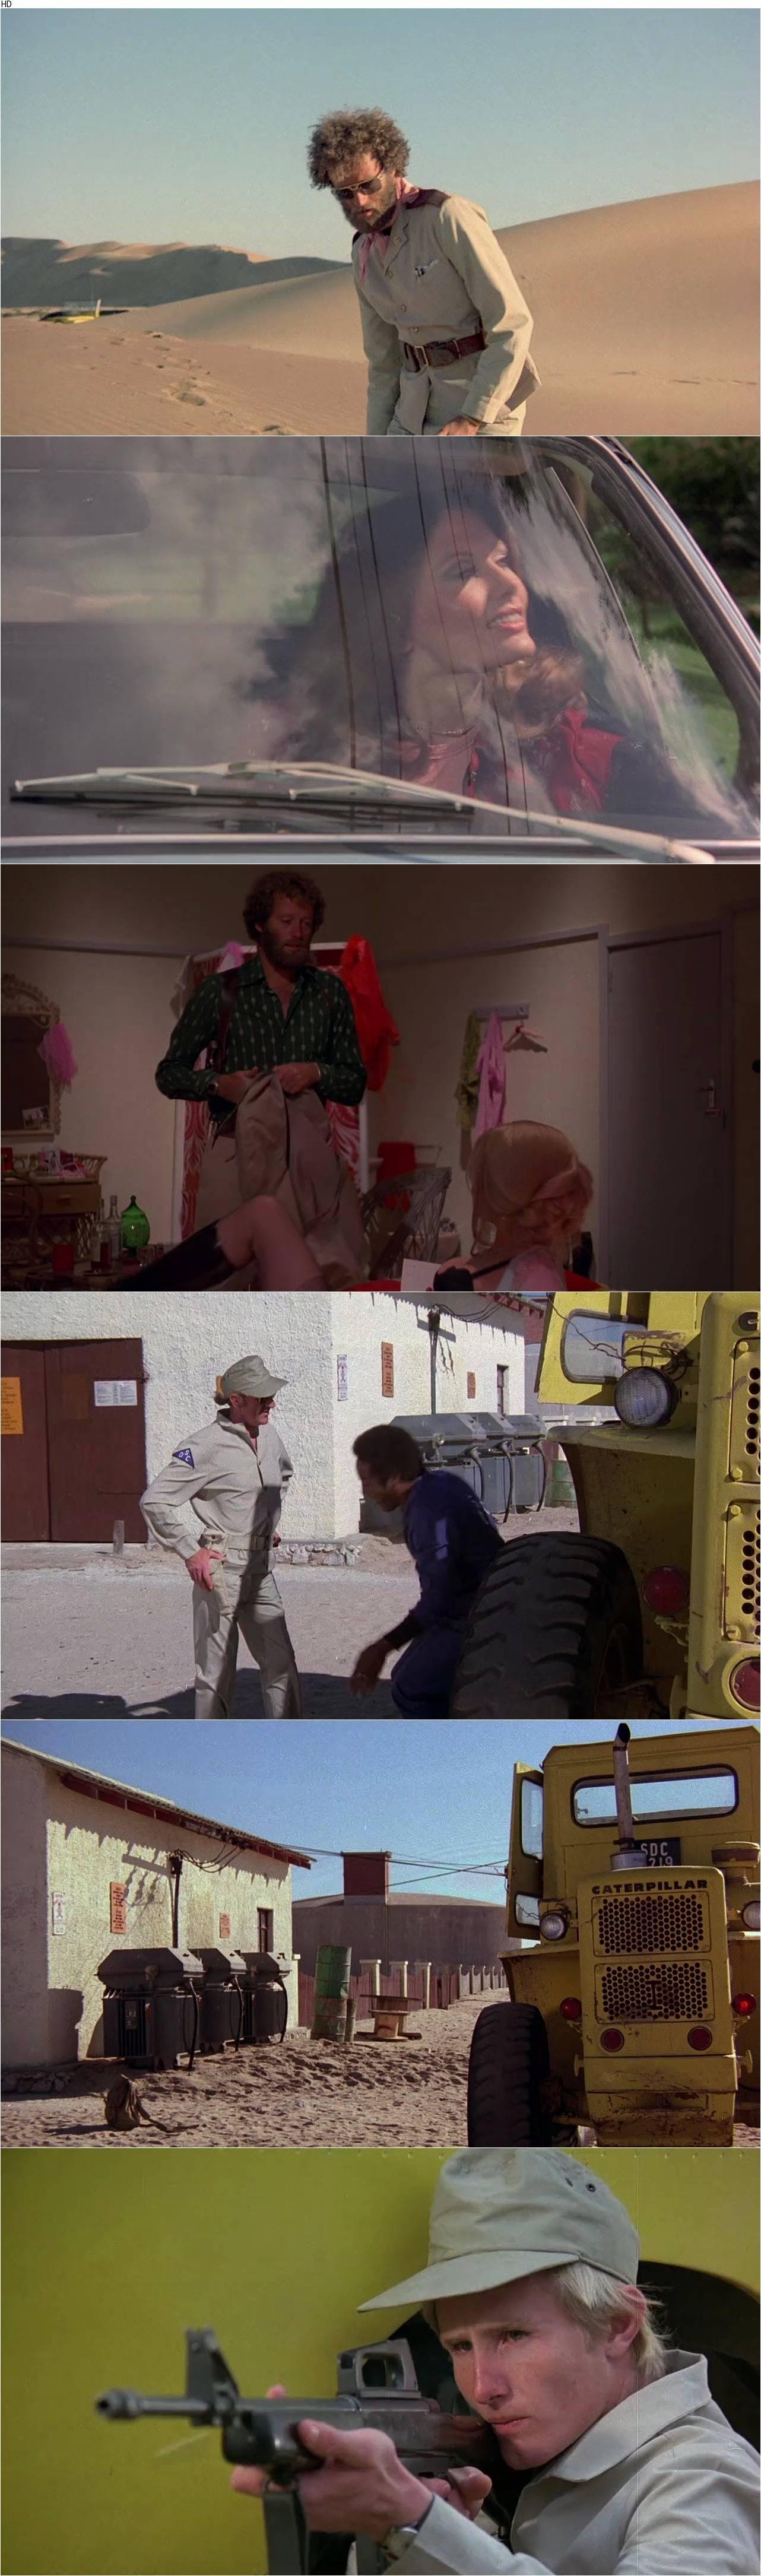 Killer Force (1976)